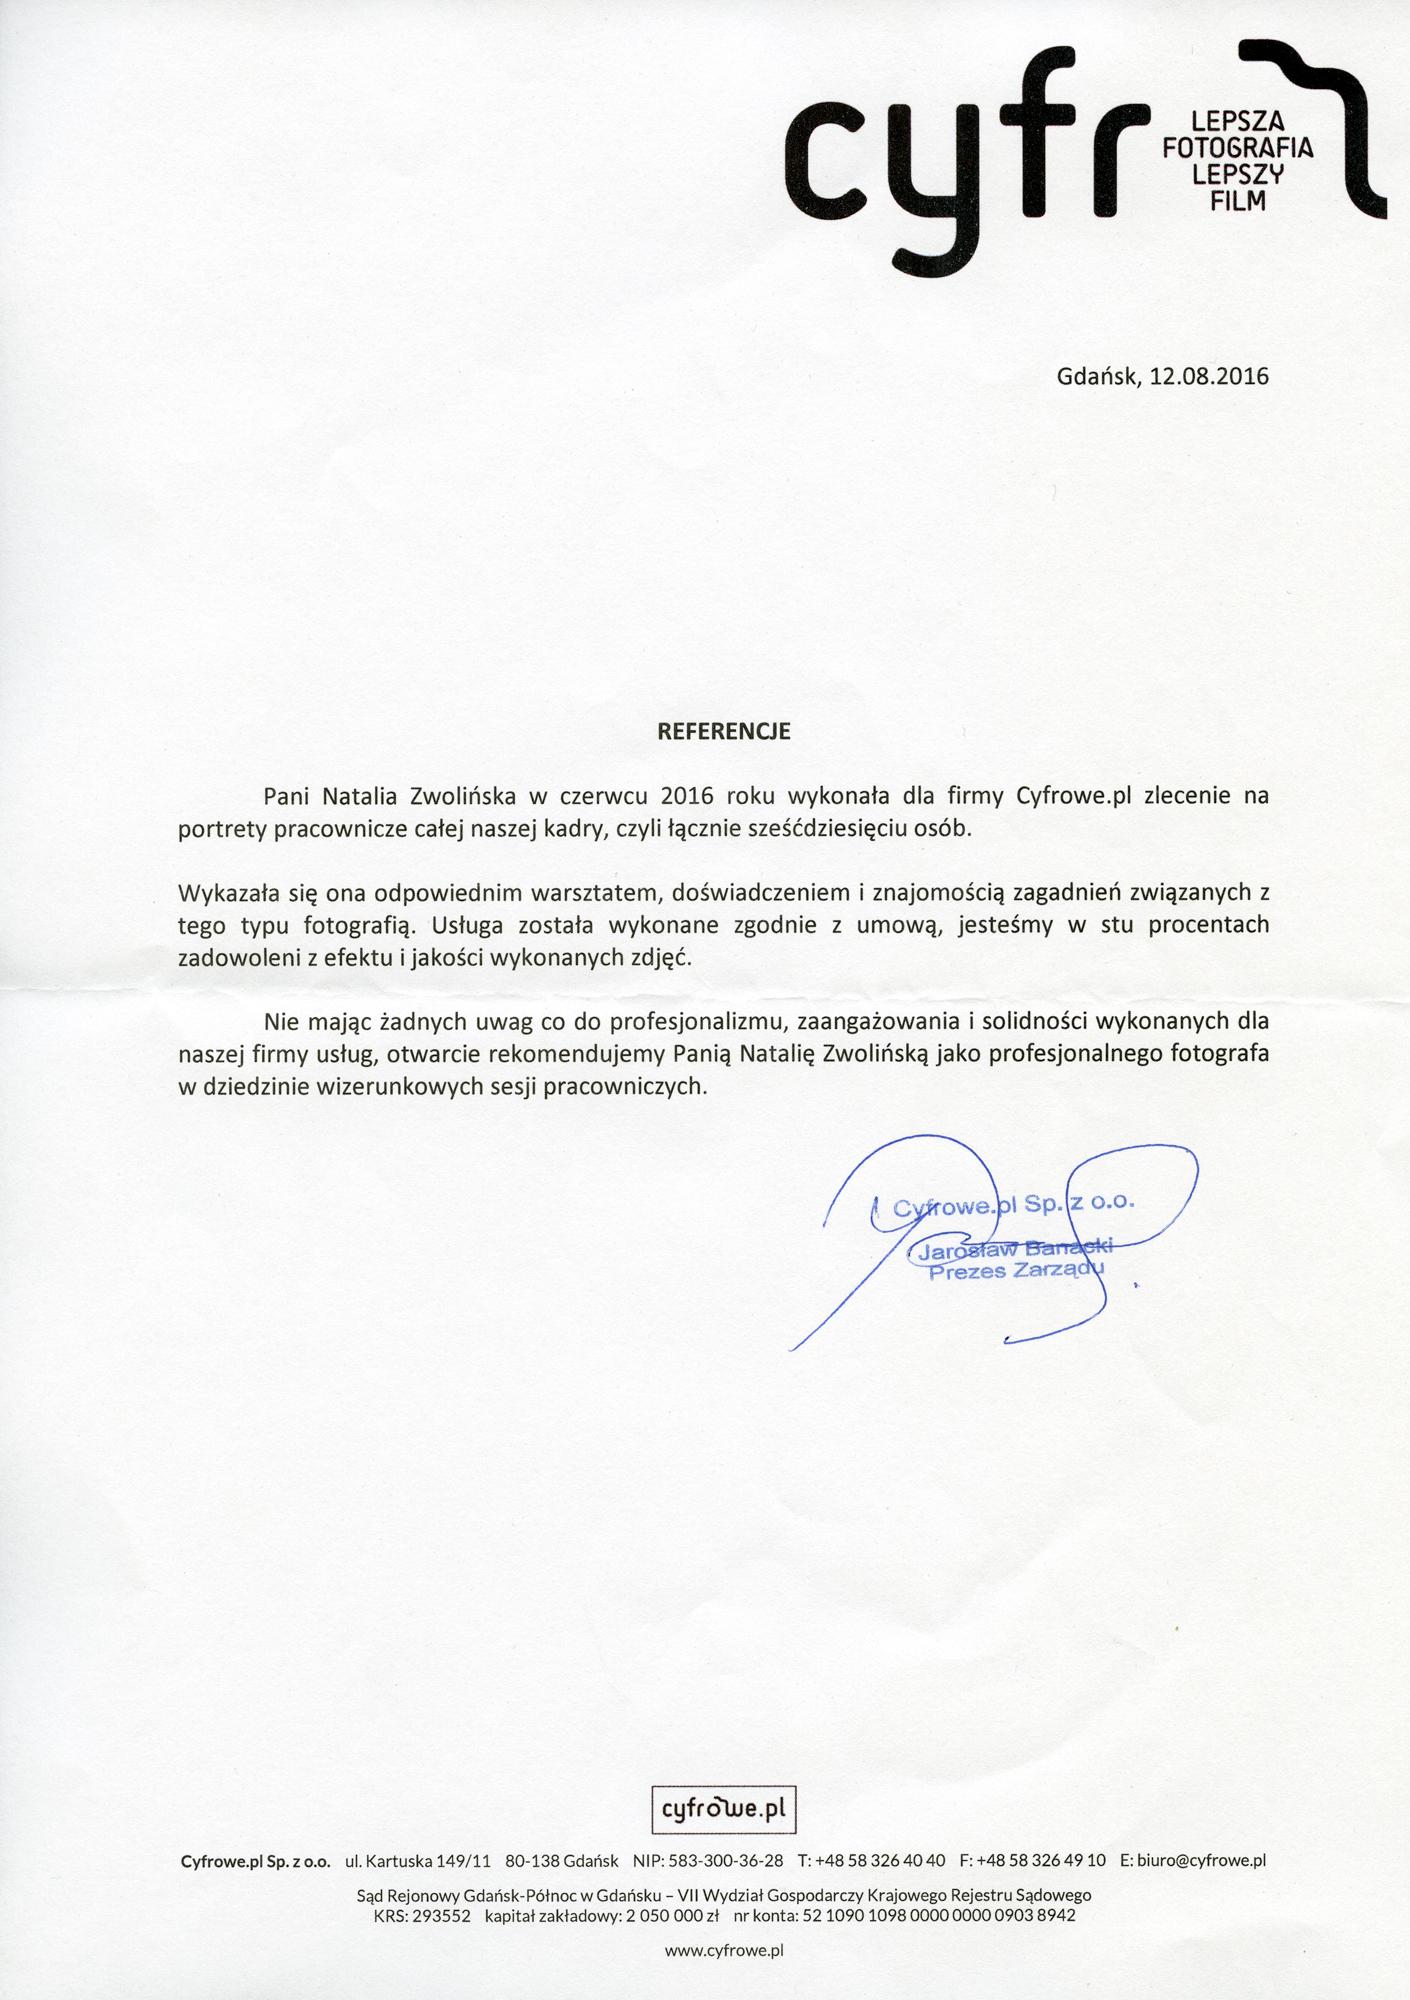 Referencje - Sesja korporacyjna - Cyfrowe.pl - Gdańsk